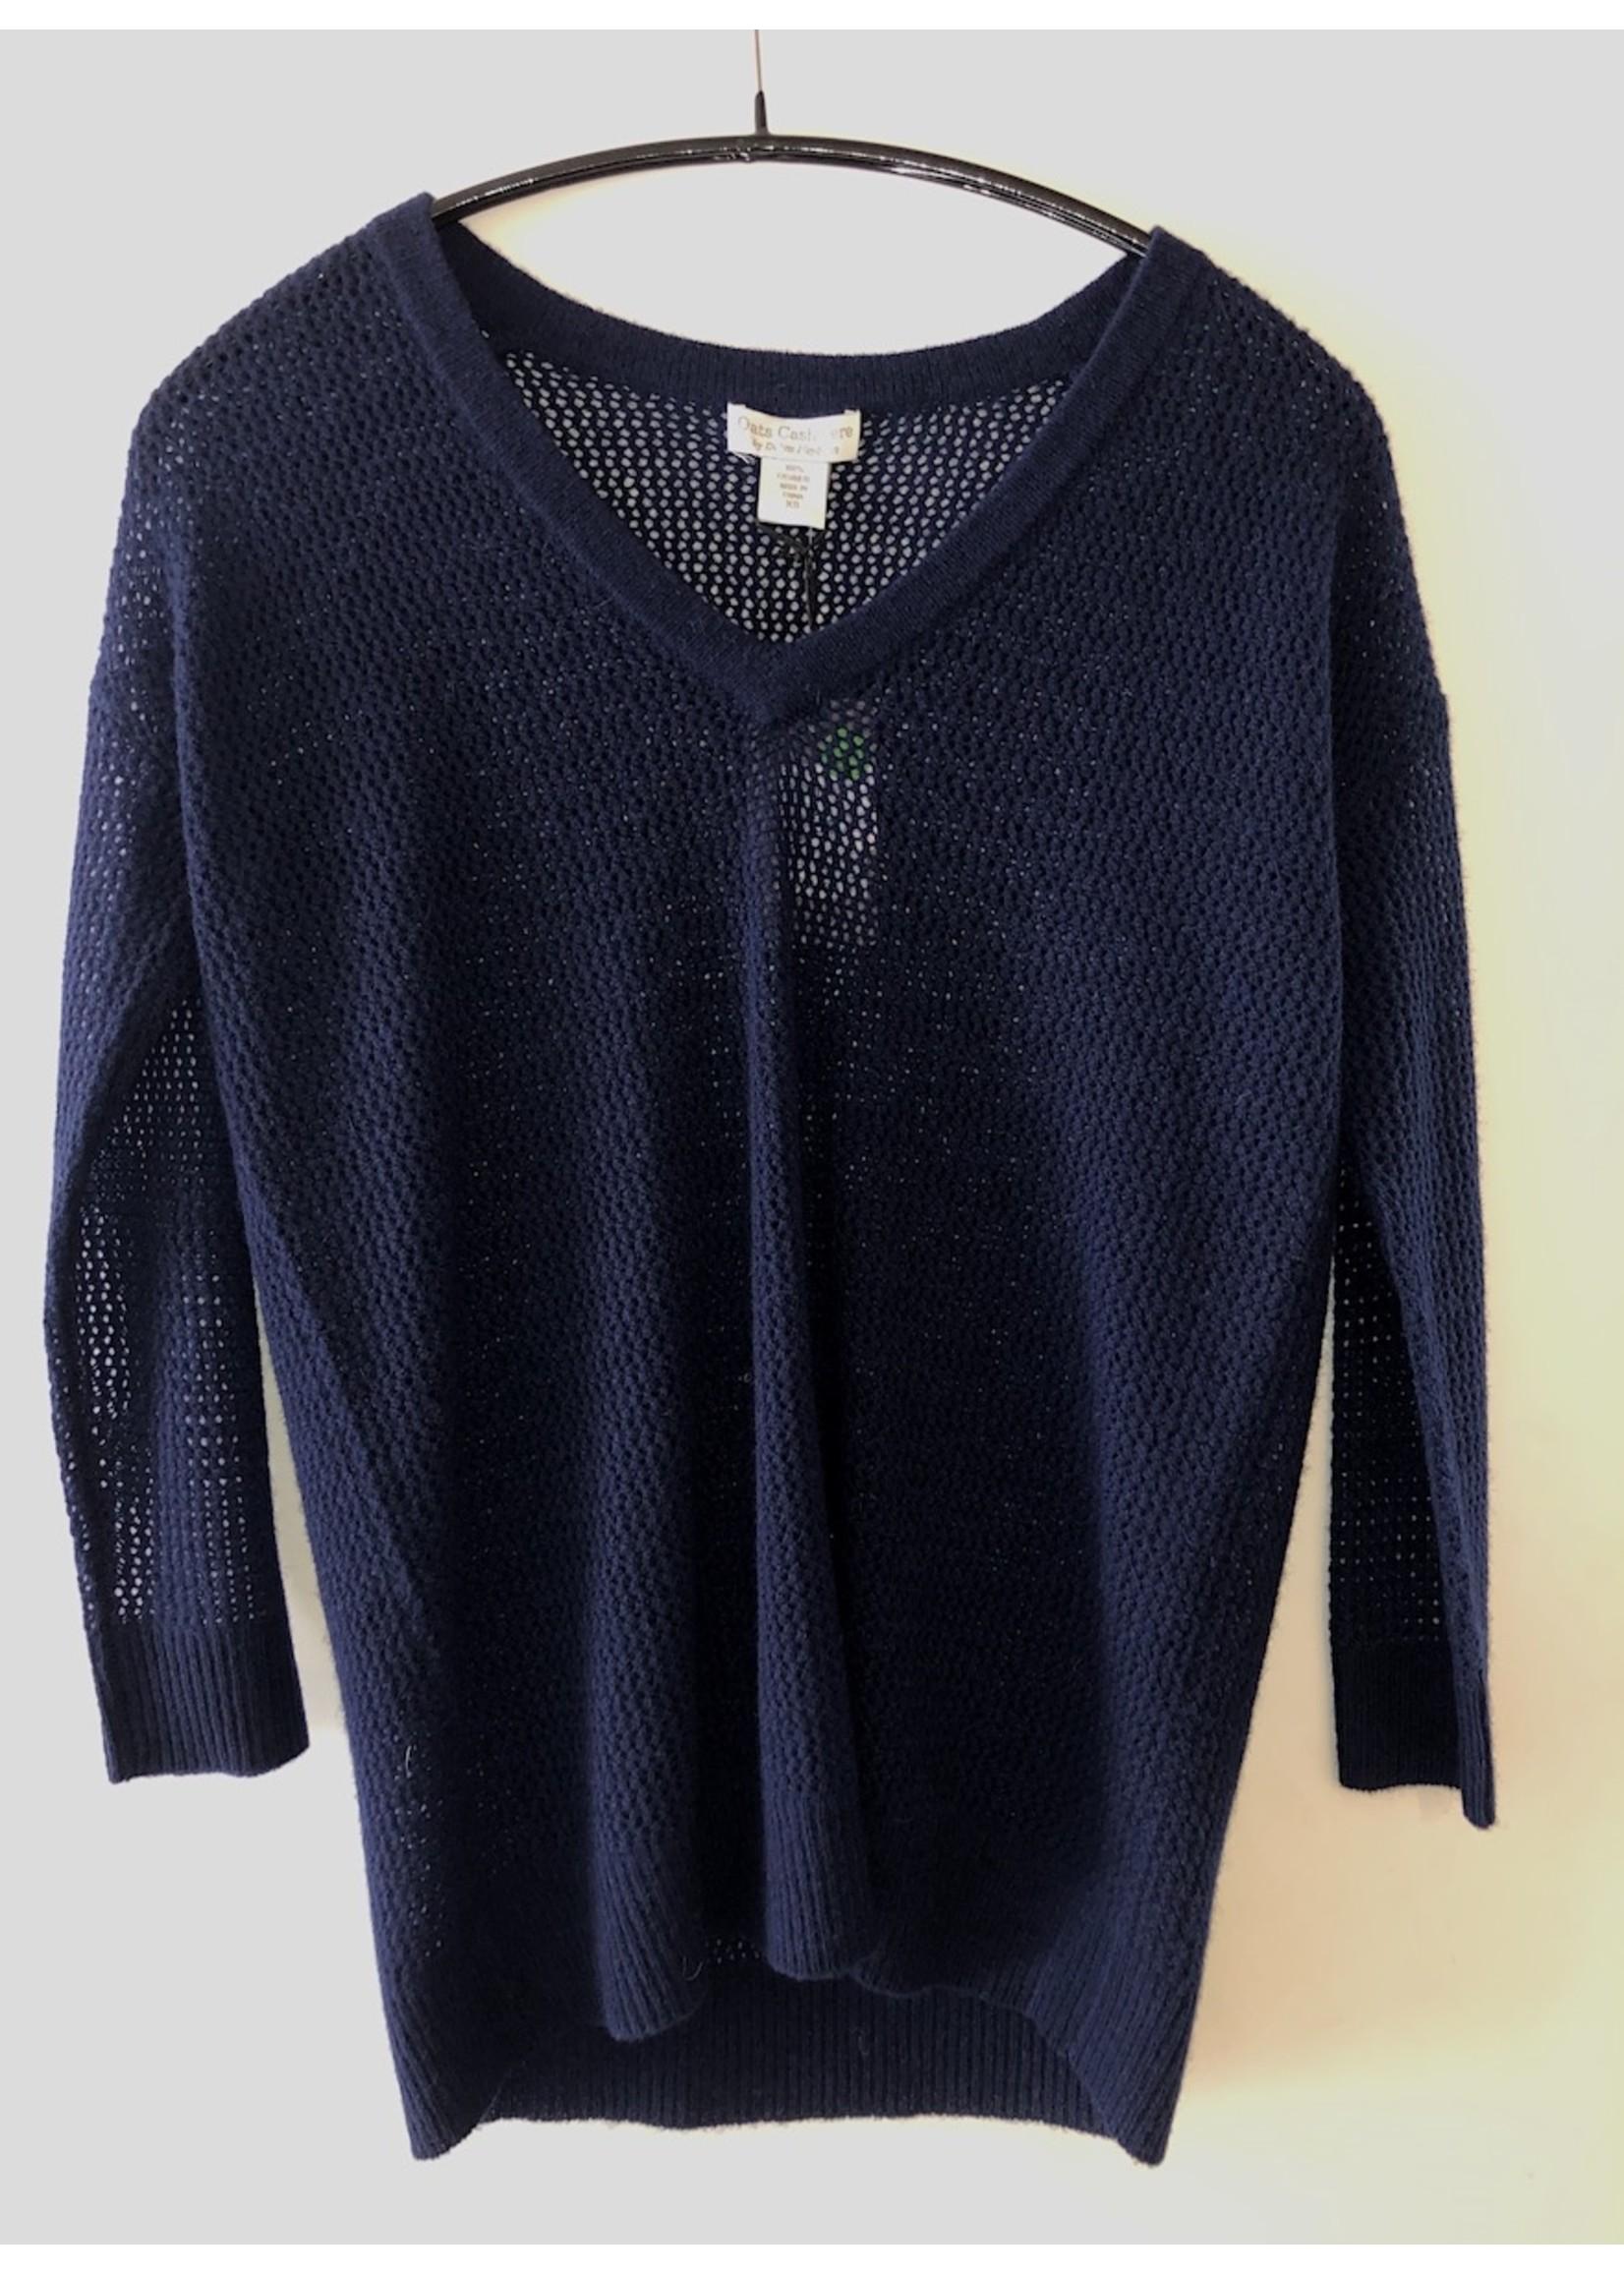 Oats Cashmere Kittie Cashmere Sweater